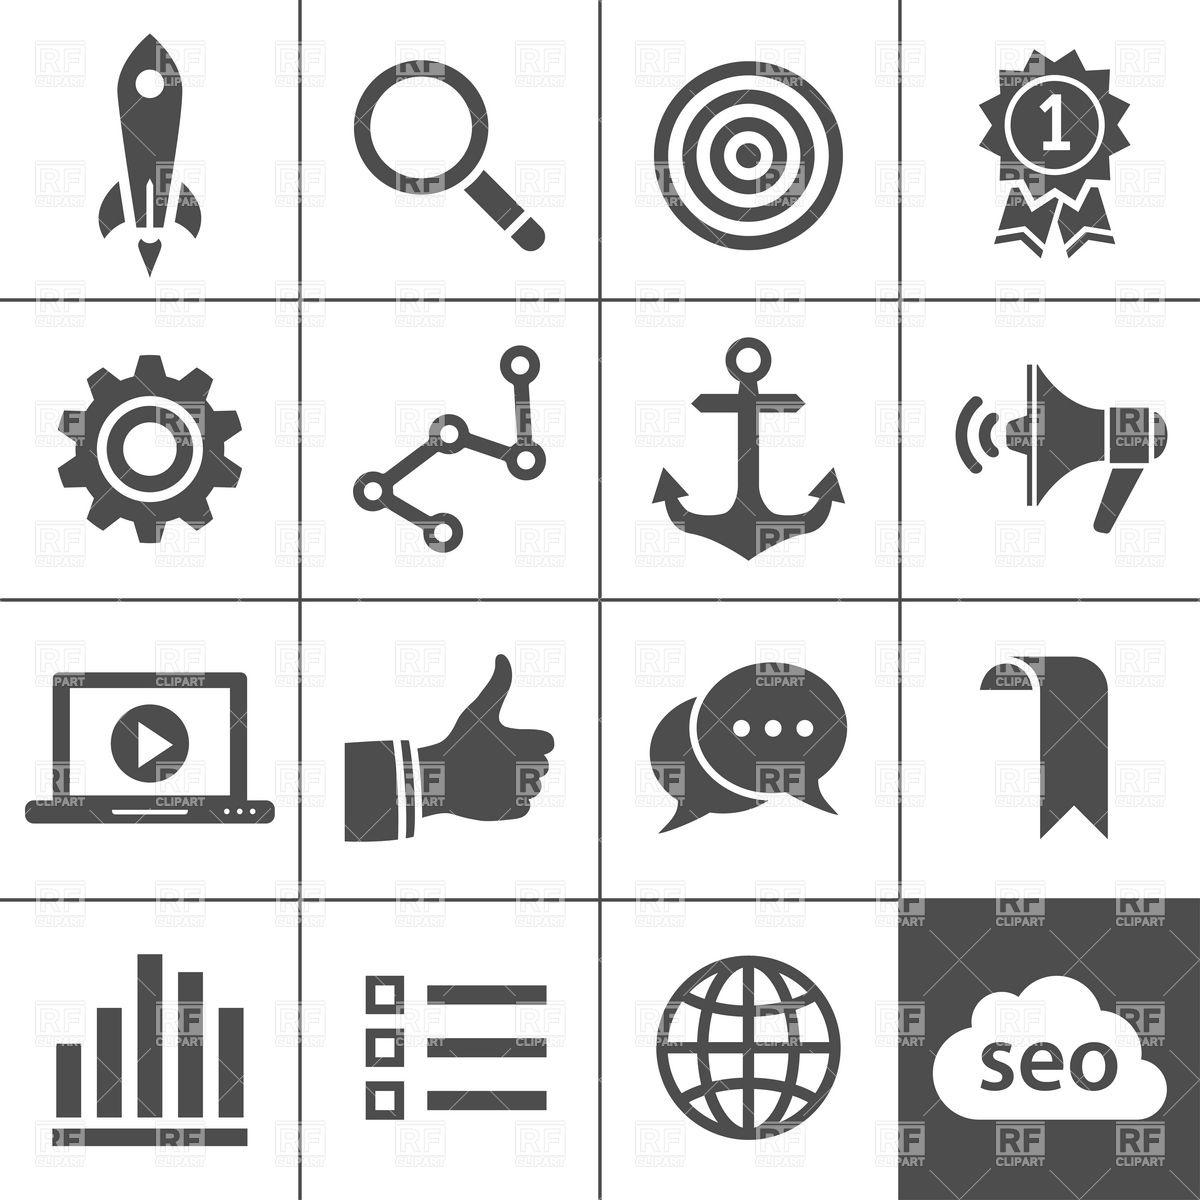 1200x1200 Search Engine Optimization, Analytics And Internet Marketing Icons